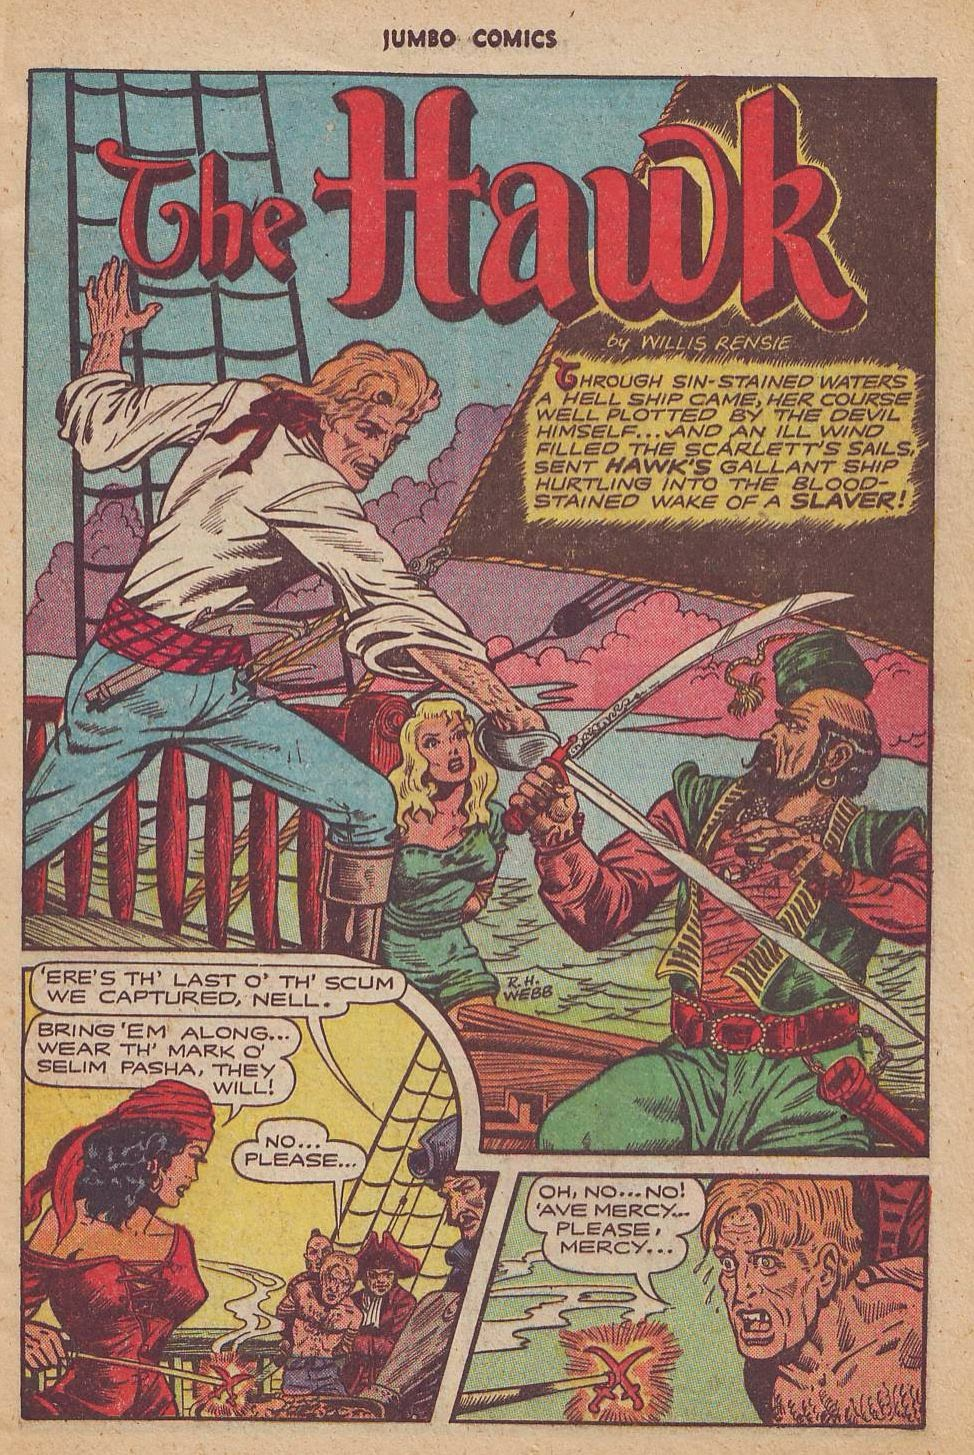 Jumbo_Comics_099_13-Hawk.jpg